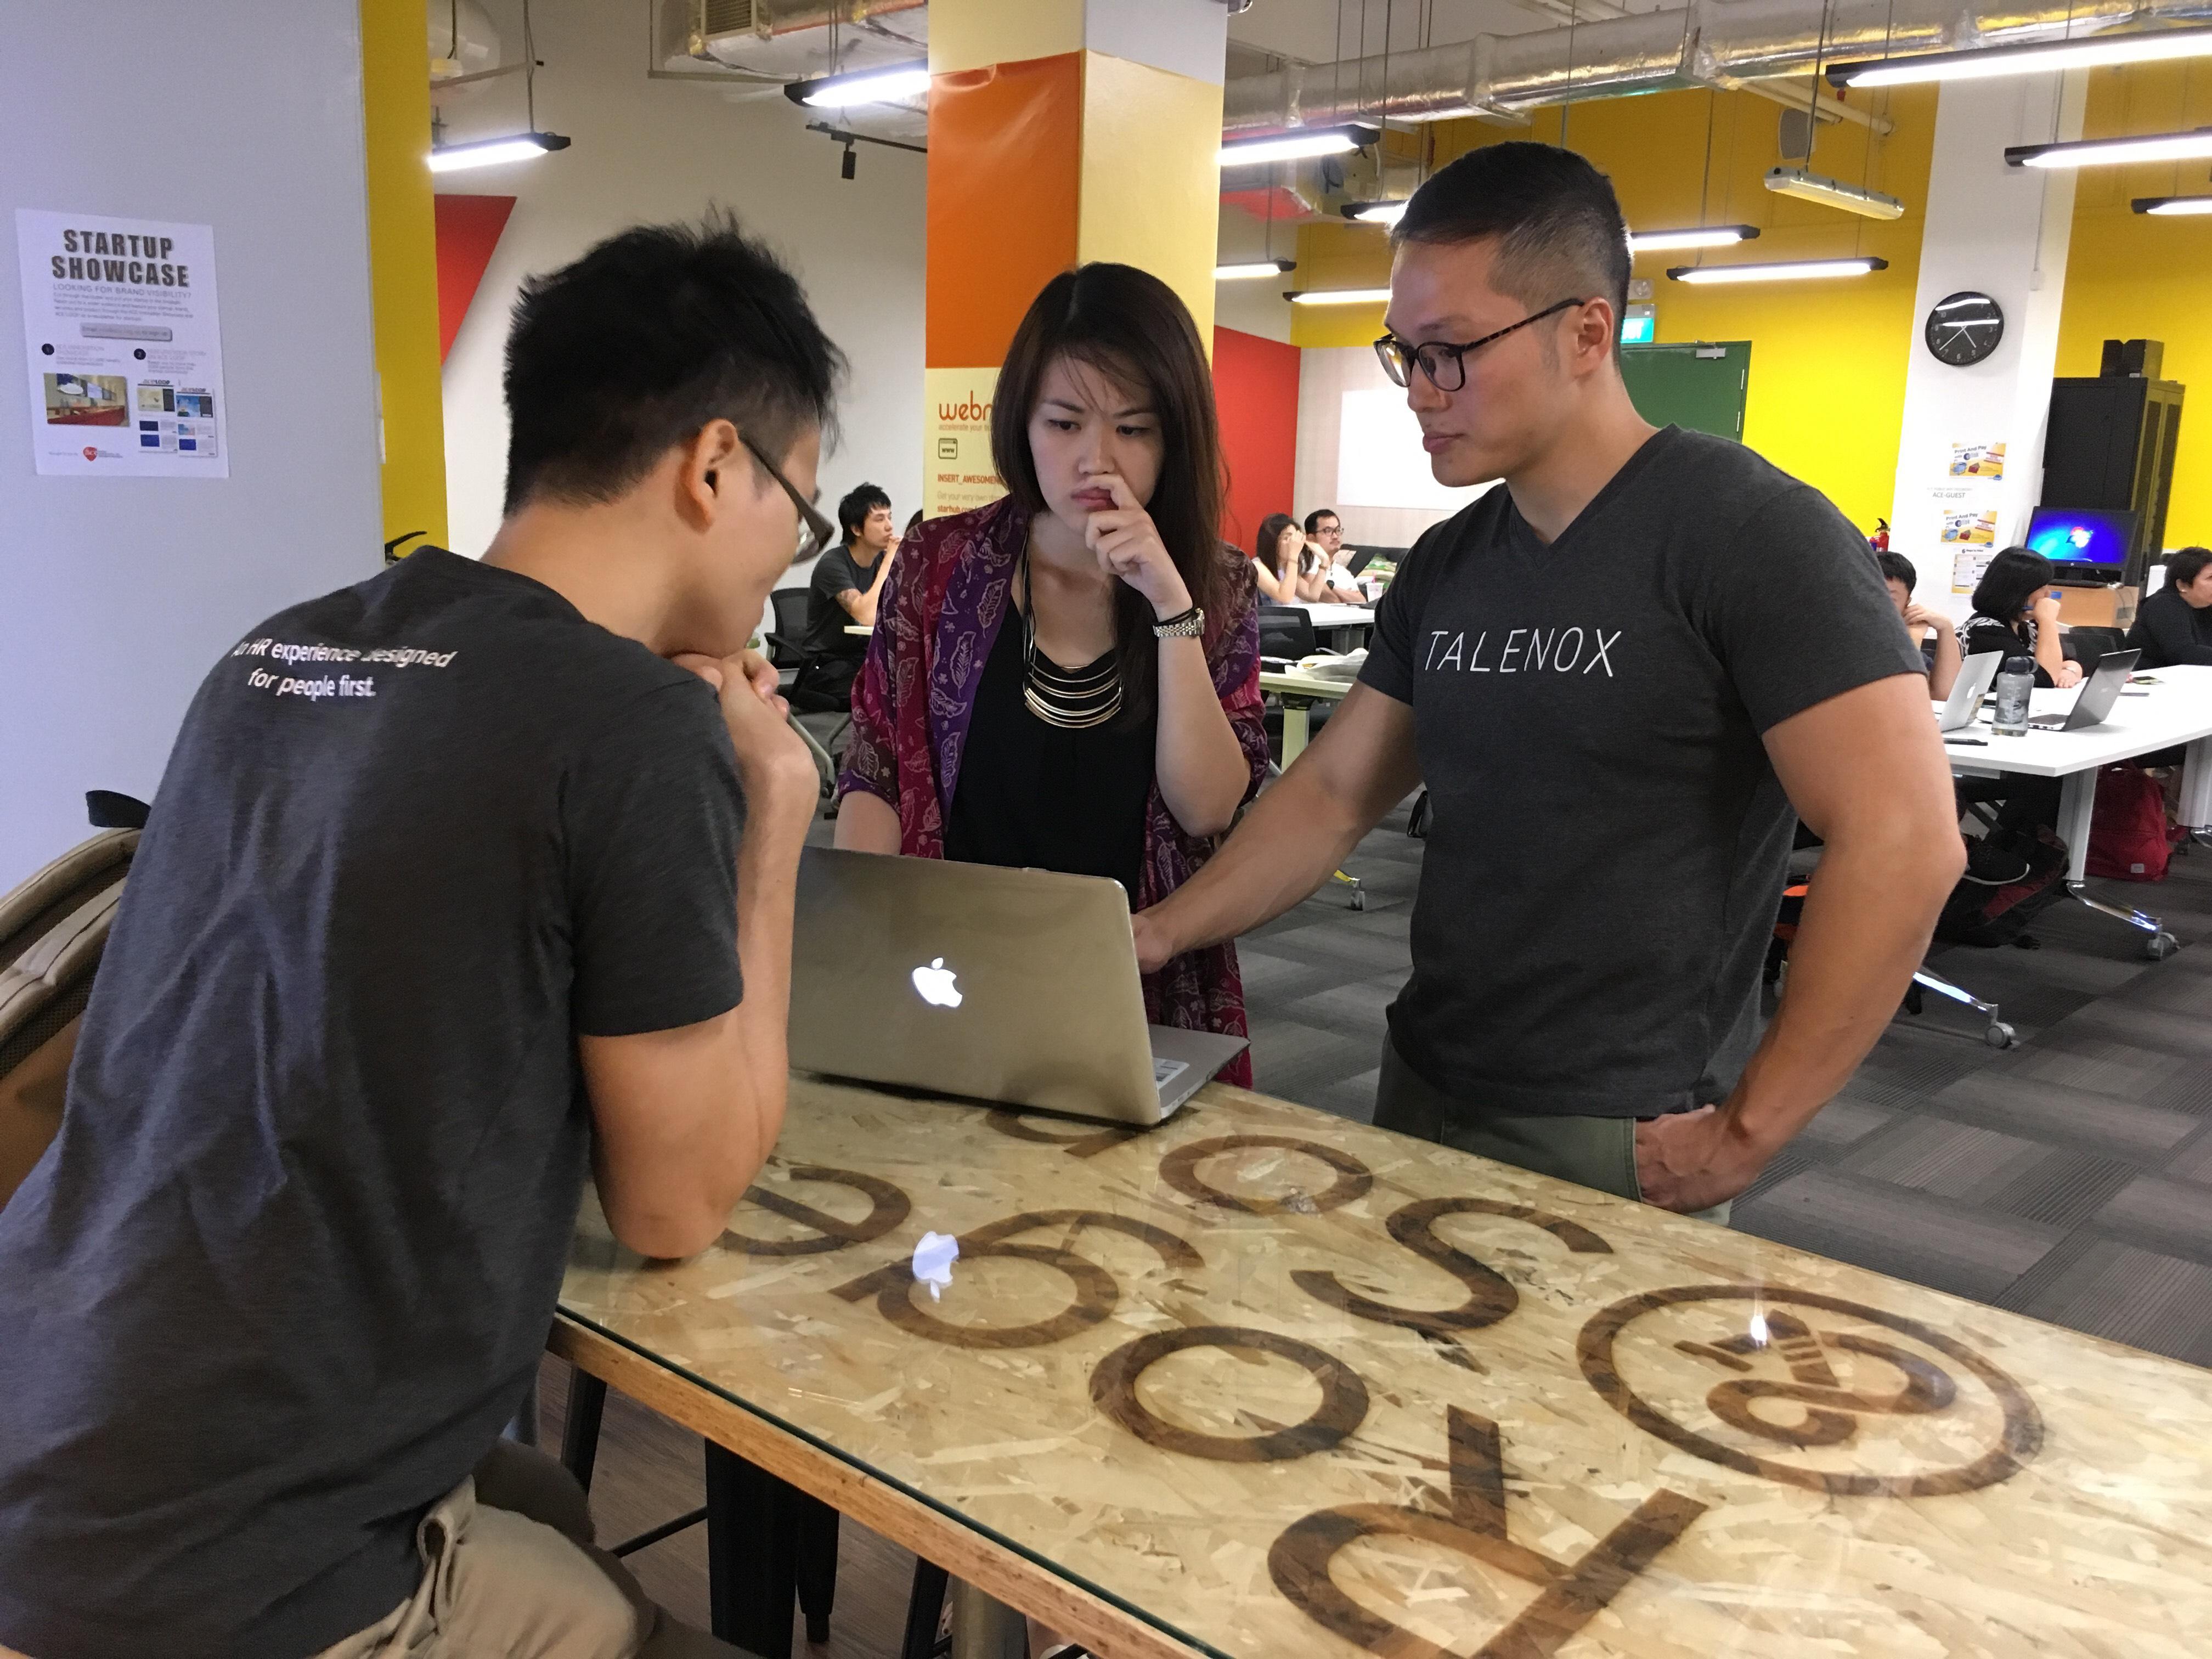 talenox blog hr tech clinic